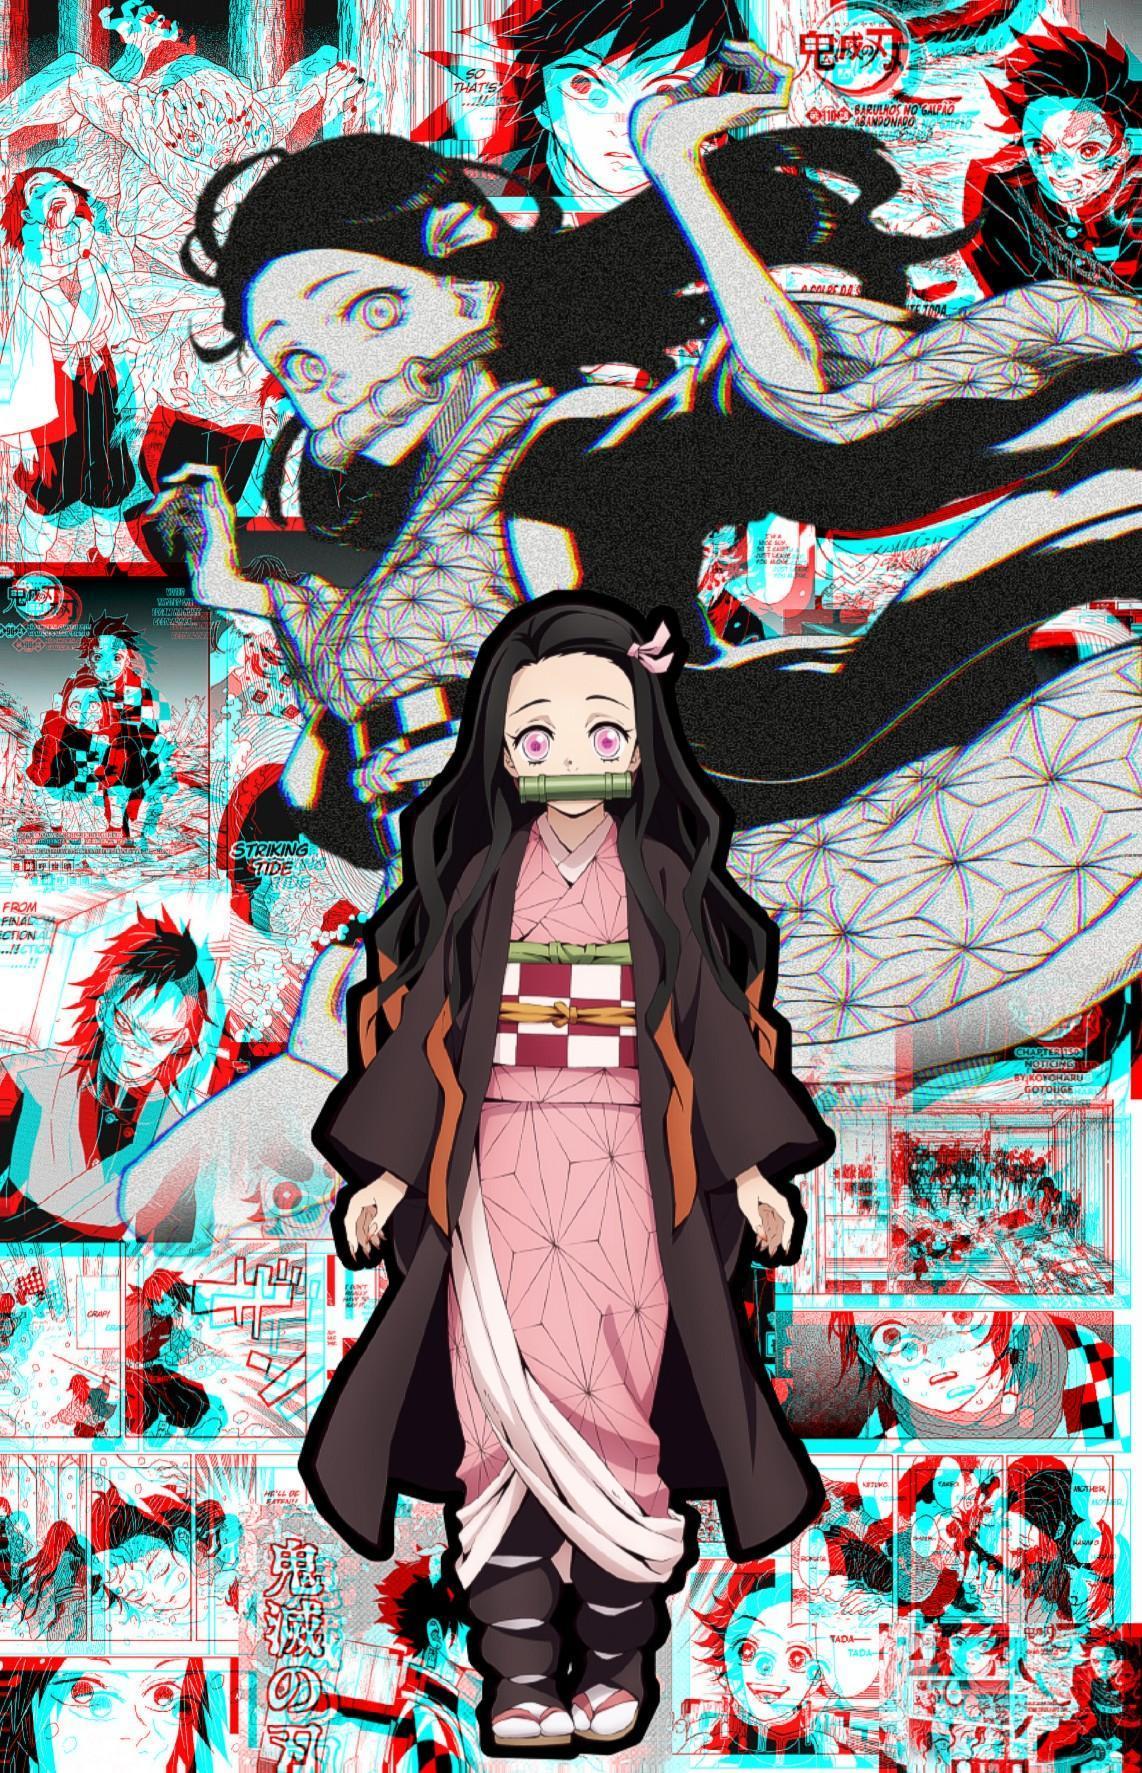 Nezuko Wallpaper : nezuko, wallpaper, Nezuko, Kimetsu, Yaiba, Wallpapers, Backgrounds, WallpaperAccess